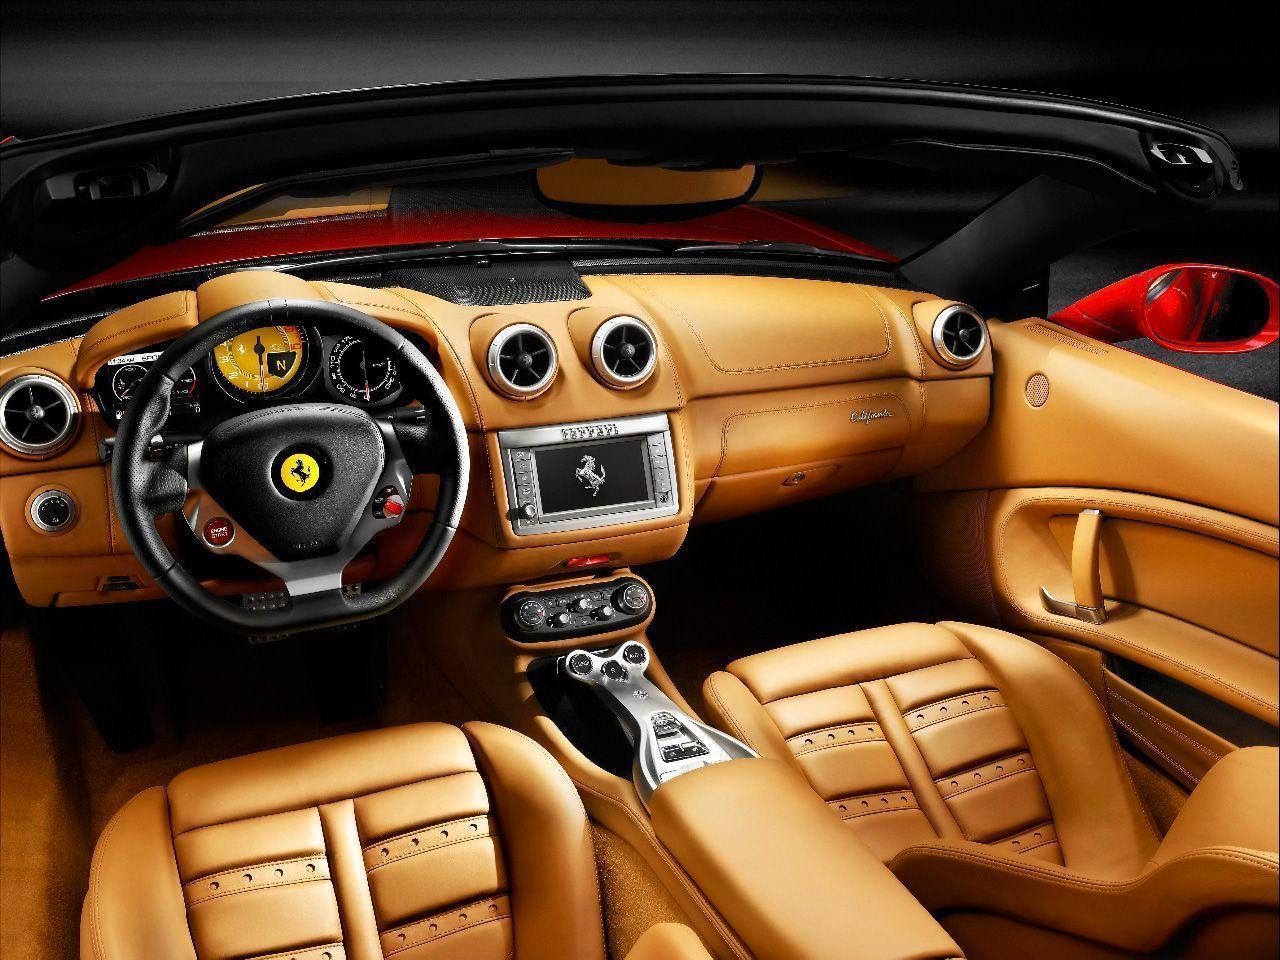 2016 ferrari enzo interior hd wallpaper hd wallpaper - Ferrari 2014 Enzo Interior